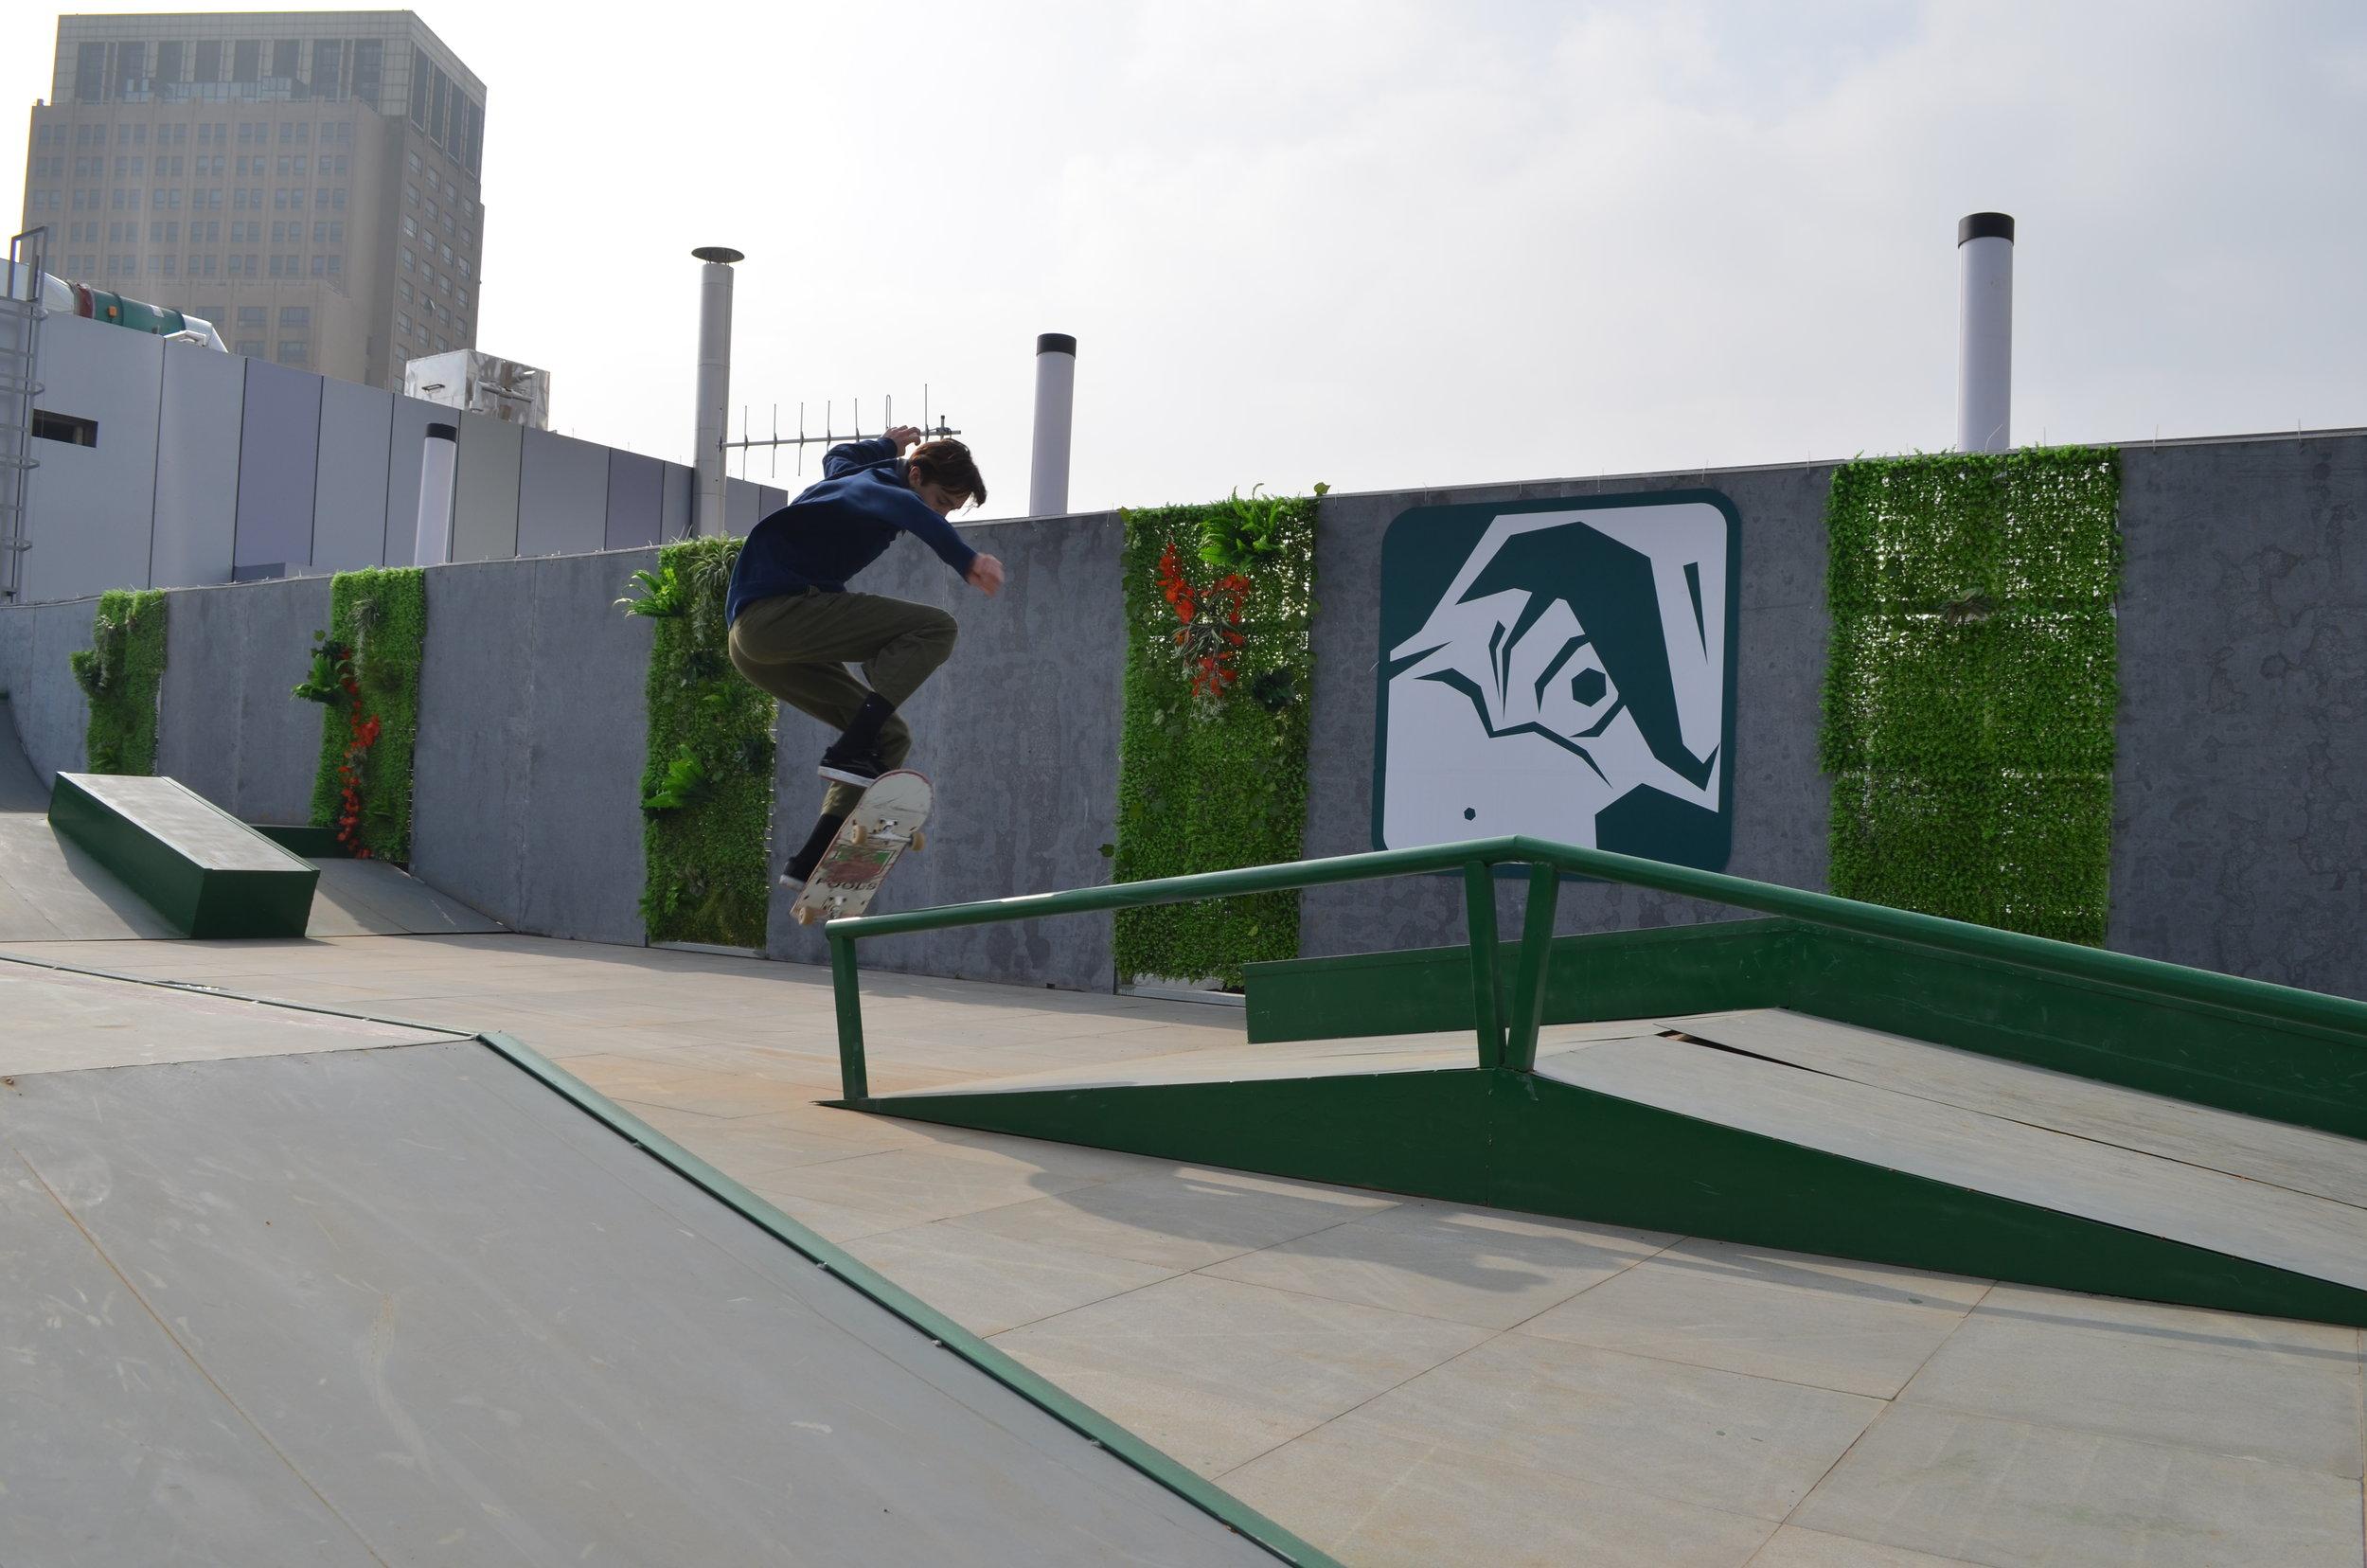 Dogtown-skatepark-nanjing-1